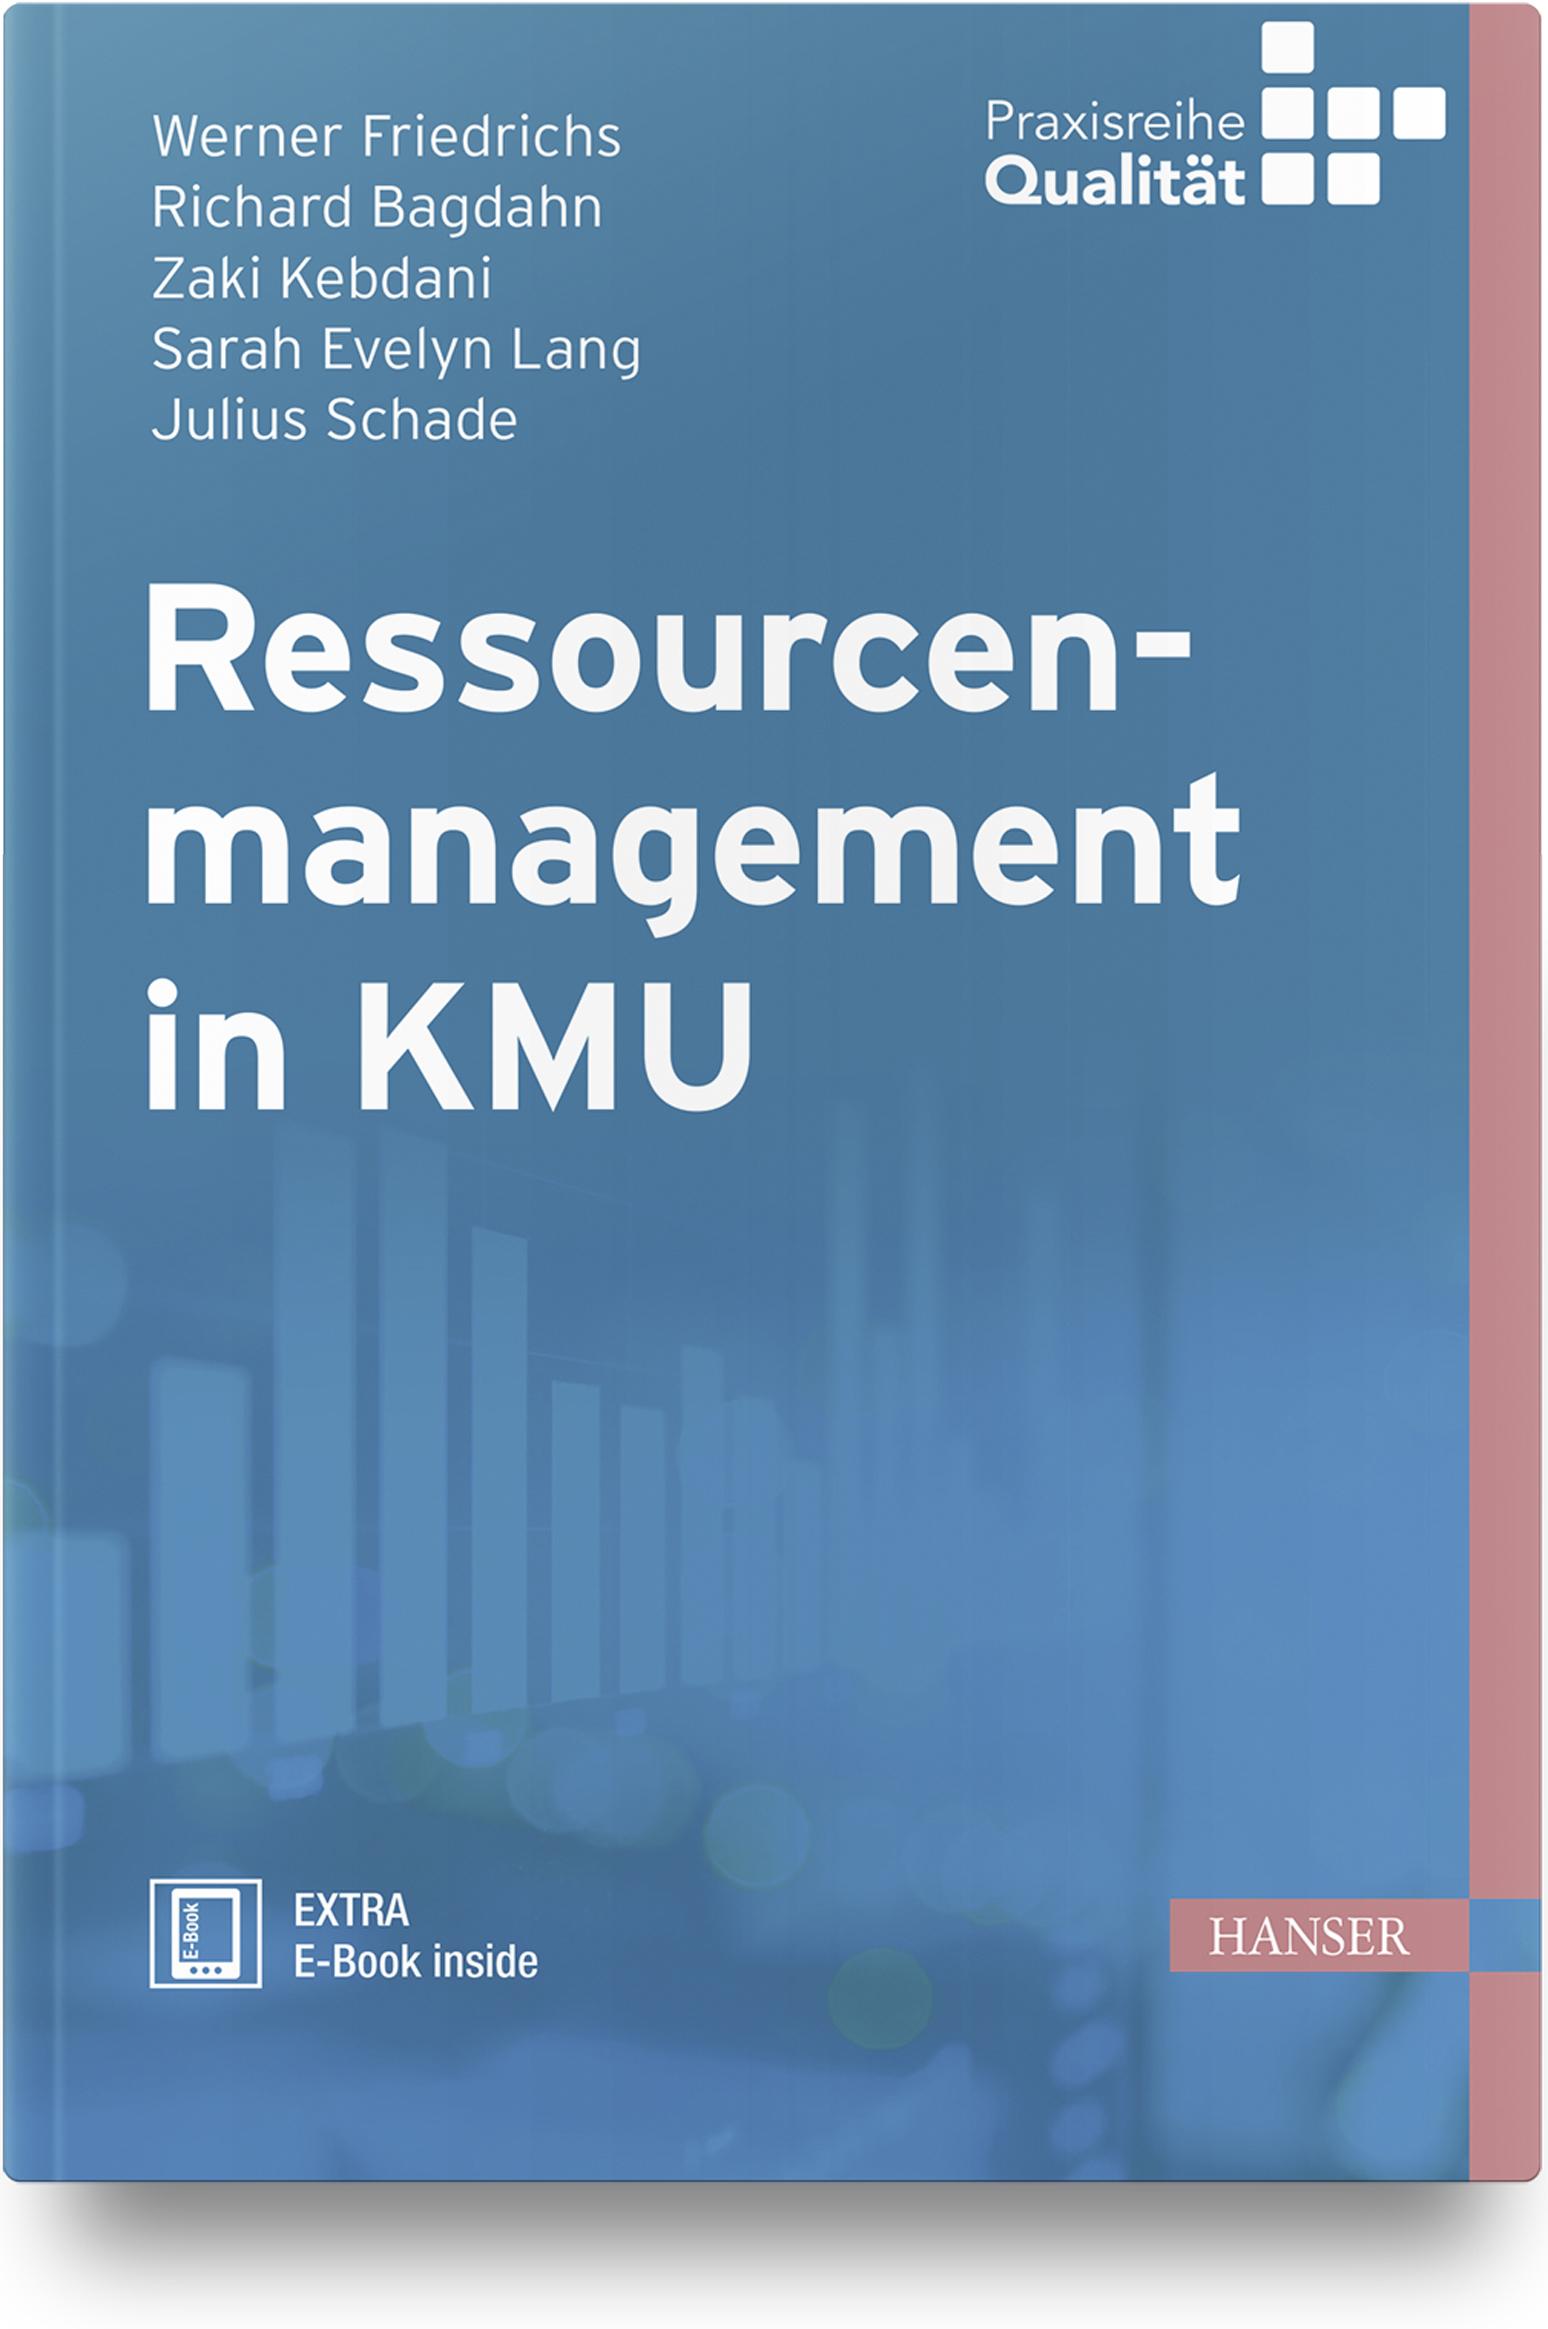 Friedrichs, Schade, Lang, Kebdani, Bagdahn, Ressourcenmanagement in KMU, 978-3-446-45766-9